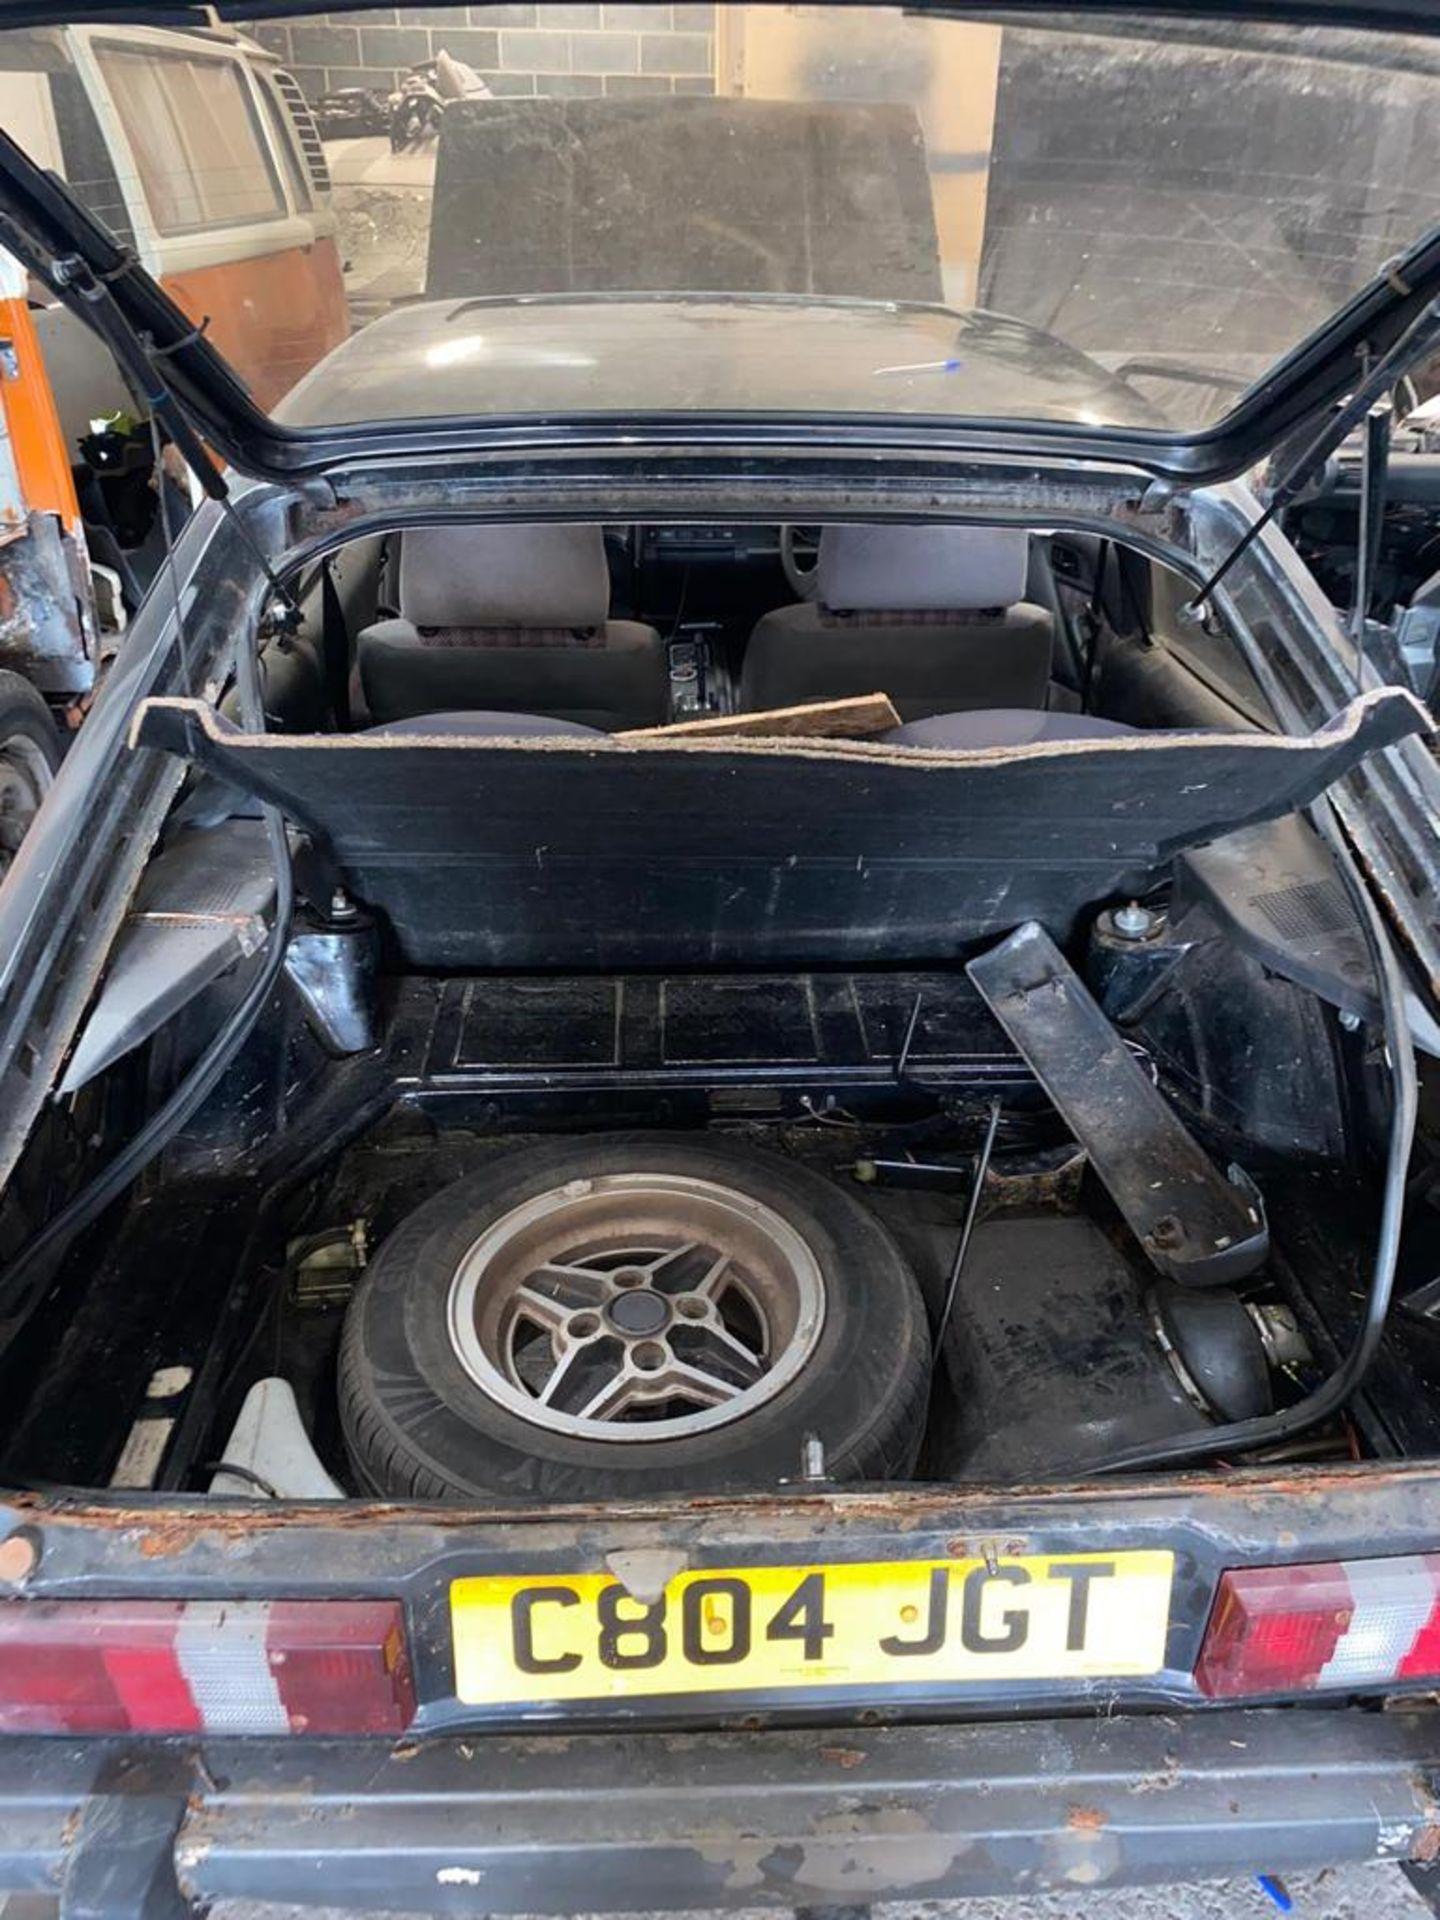 1986/C REG FORD CAPRI LASER AUTO 2.0 PETROL BLACK 3 DOOR *NO VAT* - Image 5 of 32